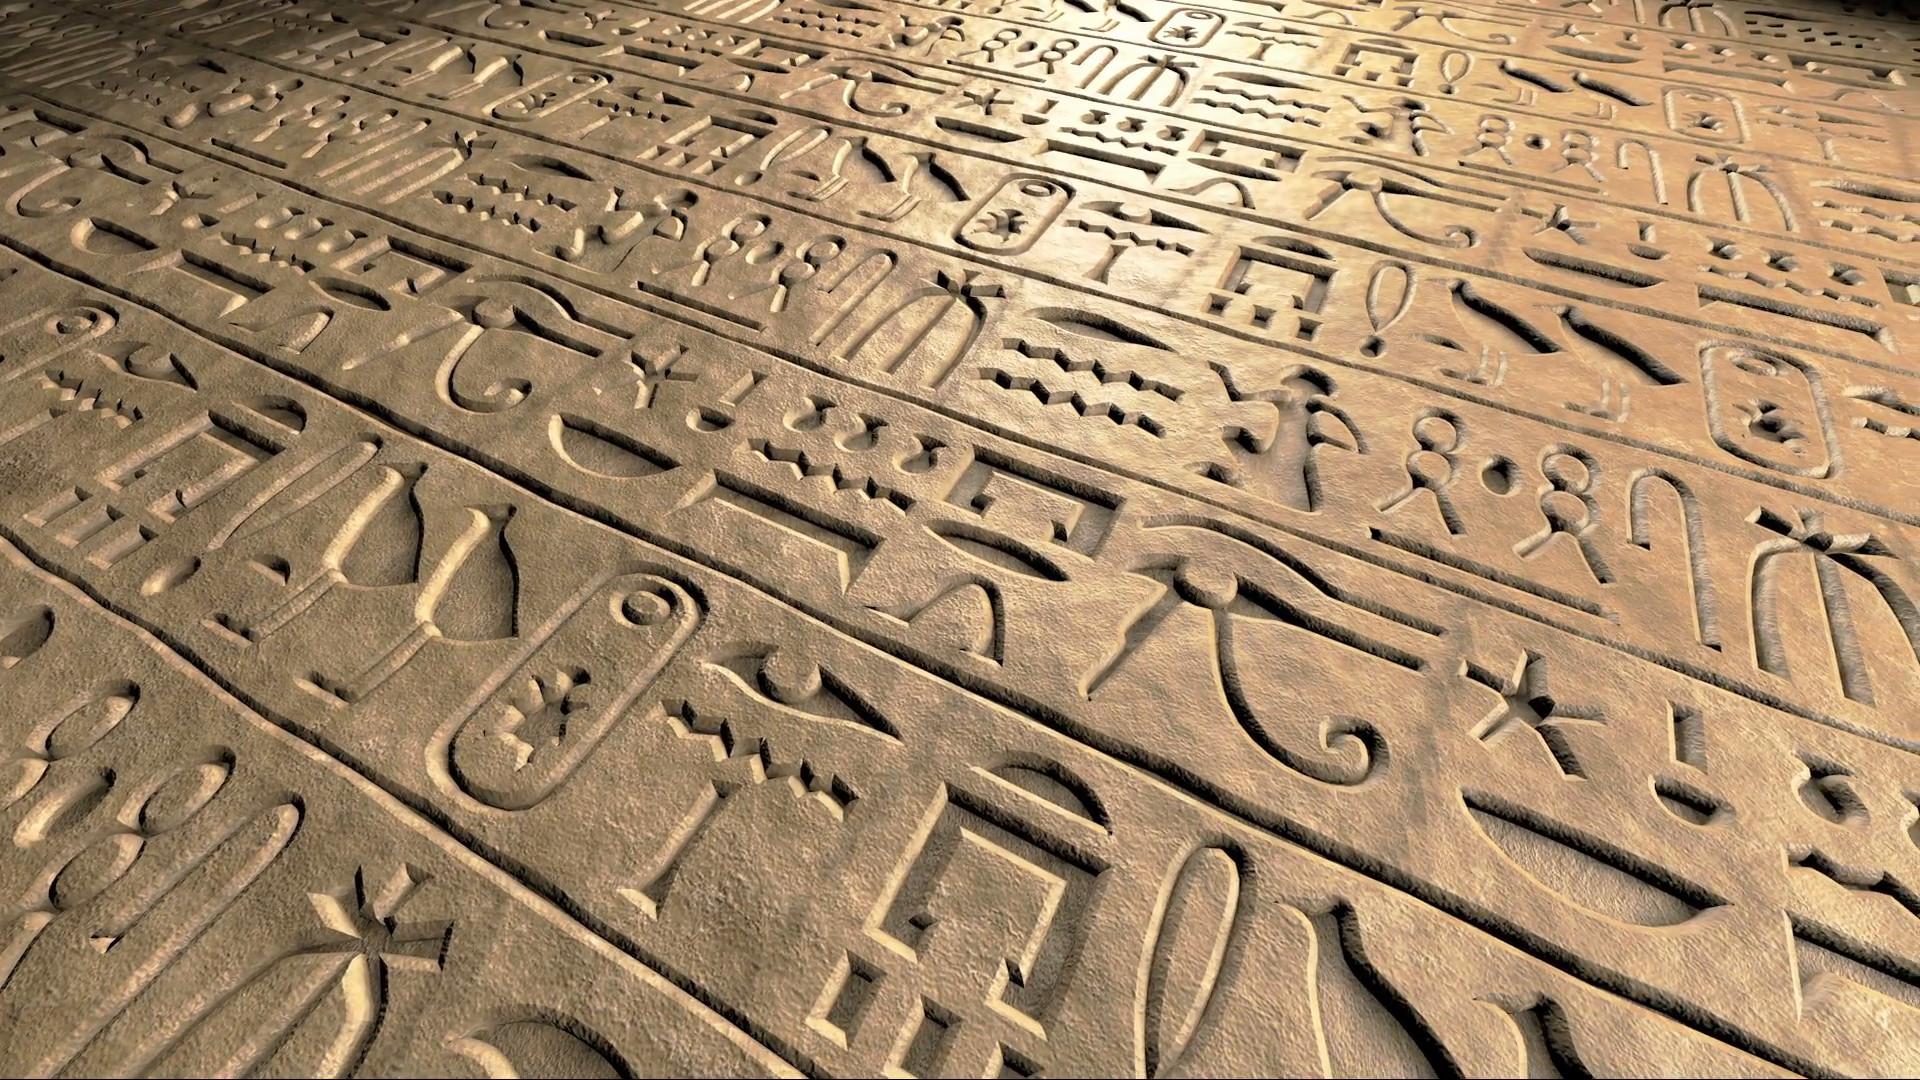 Egyptian hieroglyphics wallpaper 35 images for 3d wallpaper for home egypt